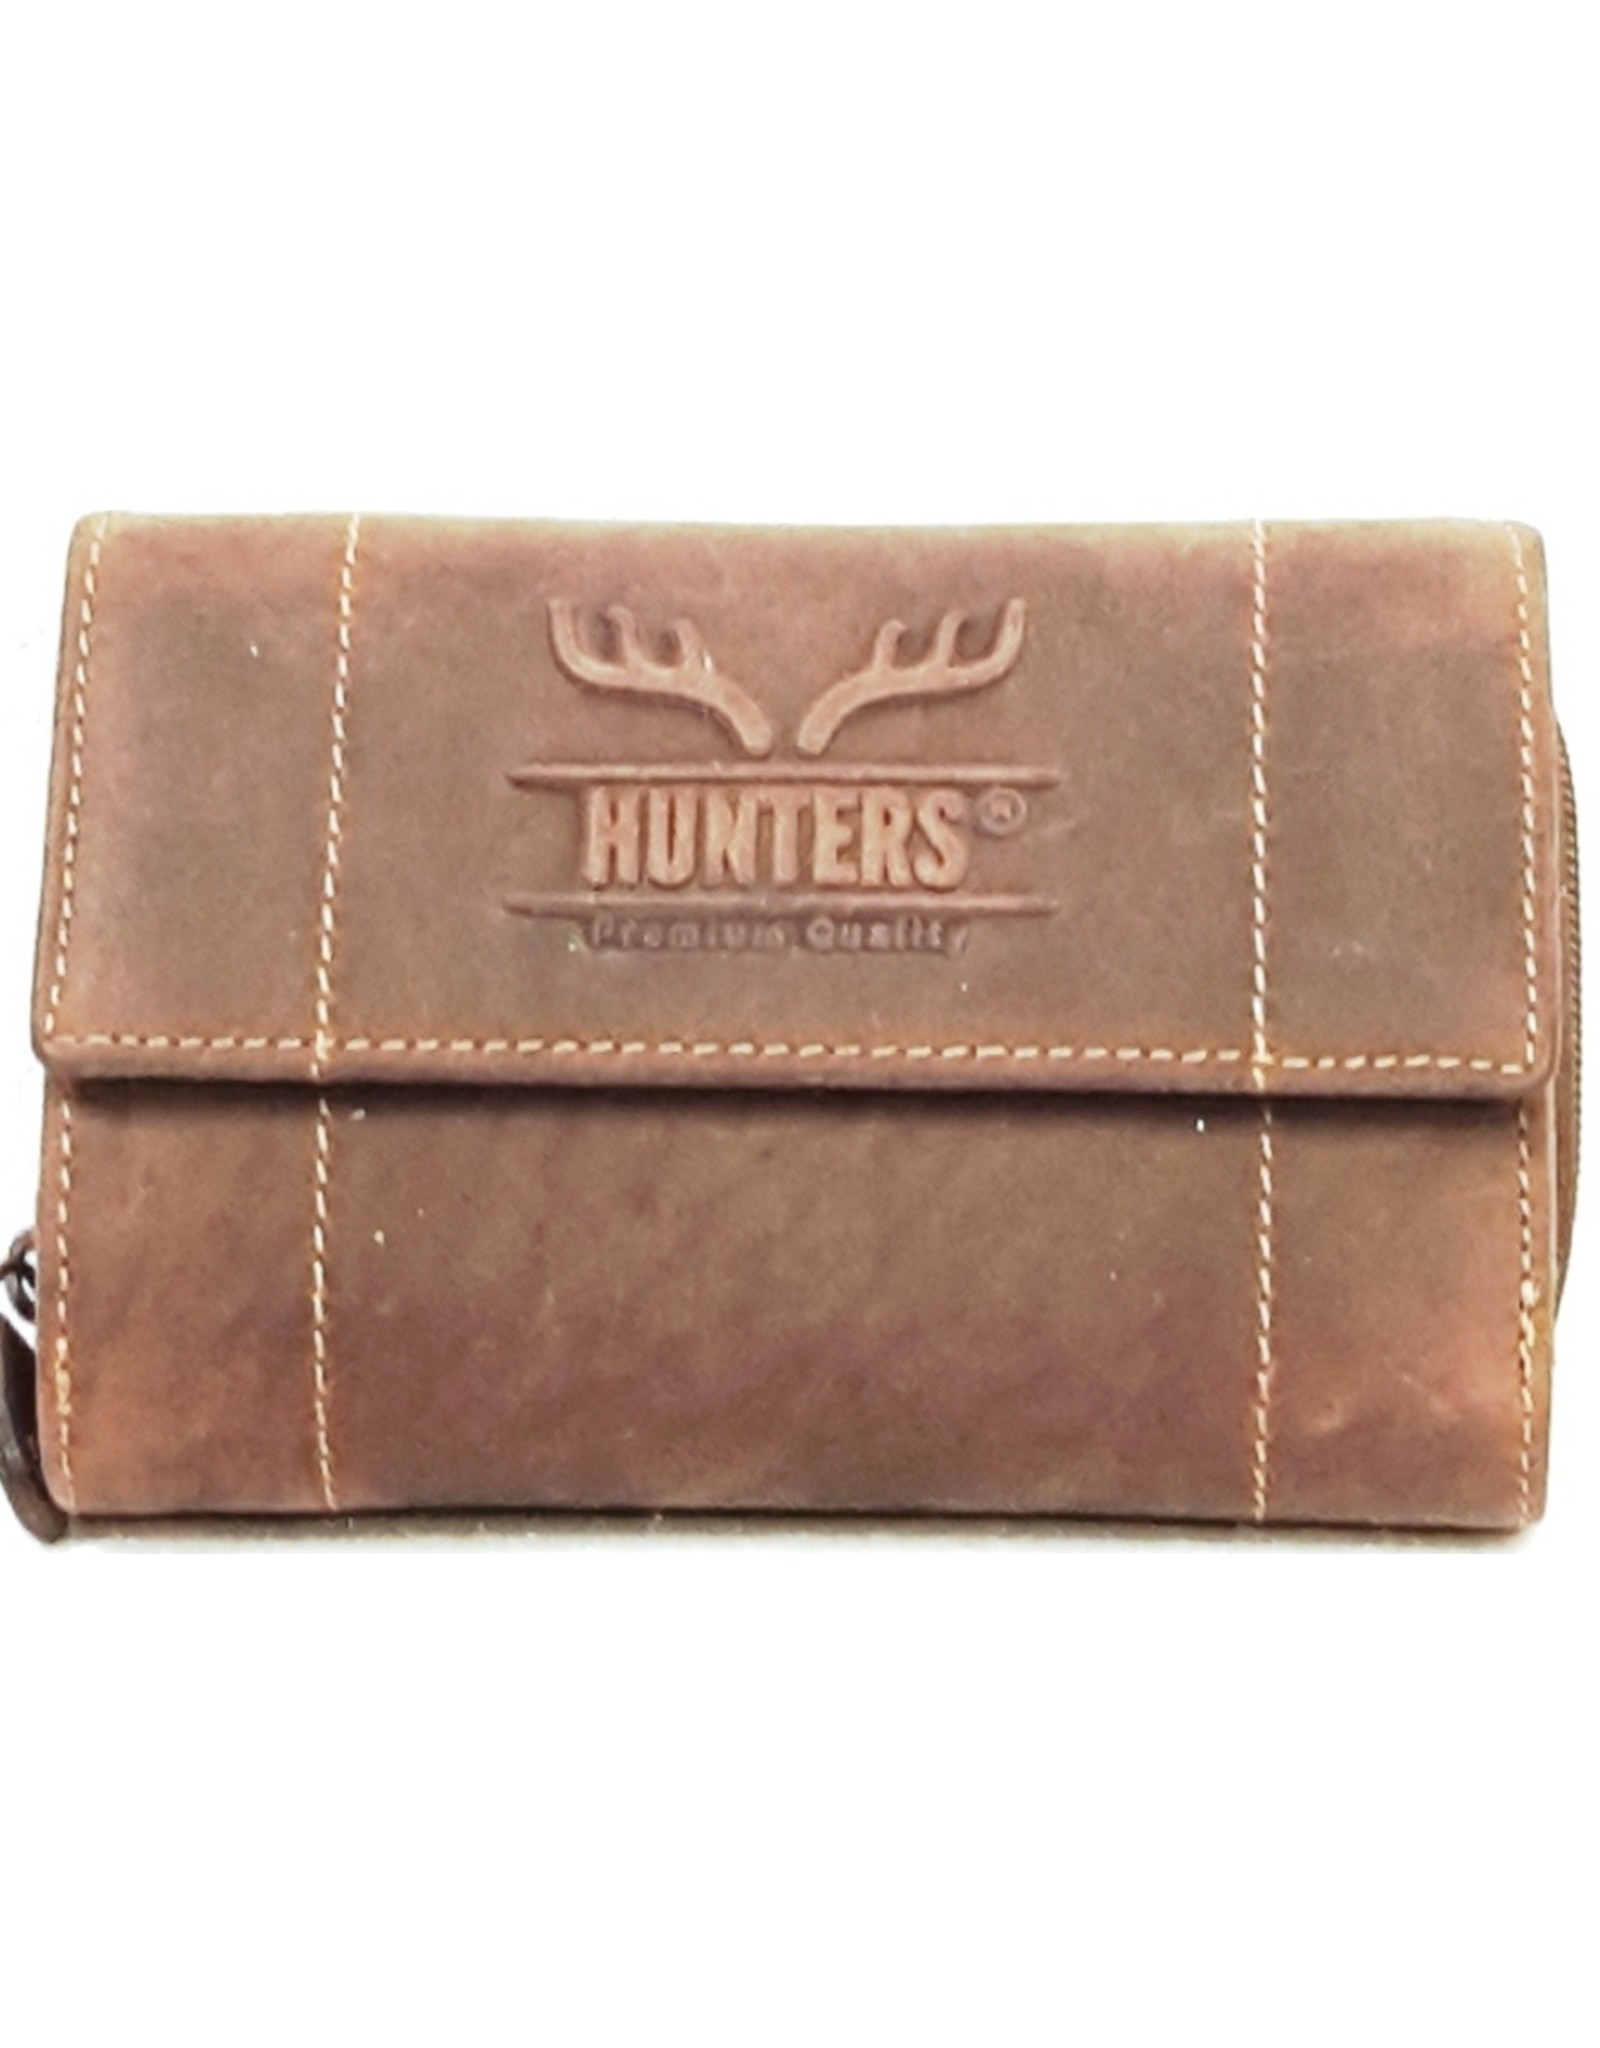 Hunters Leren Portemonnees - Leren portemonnee Hunters - Uniseks donkerbruin